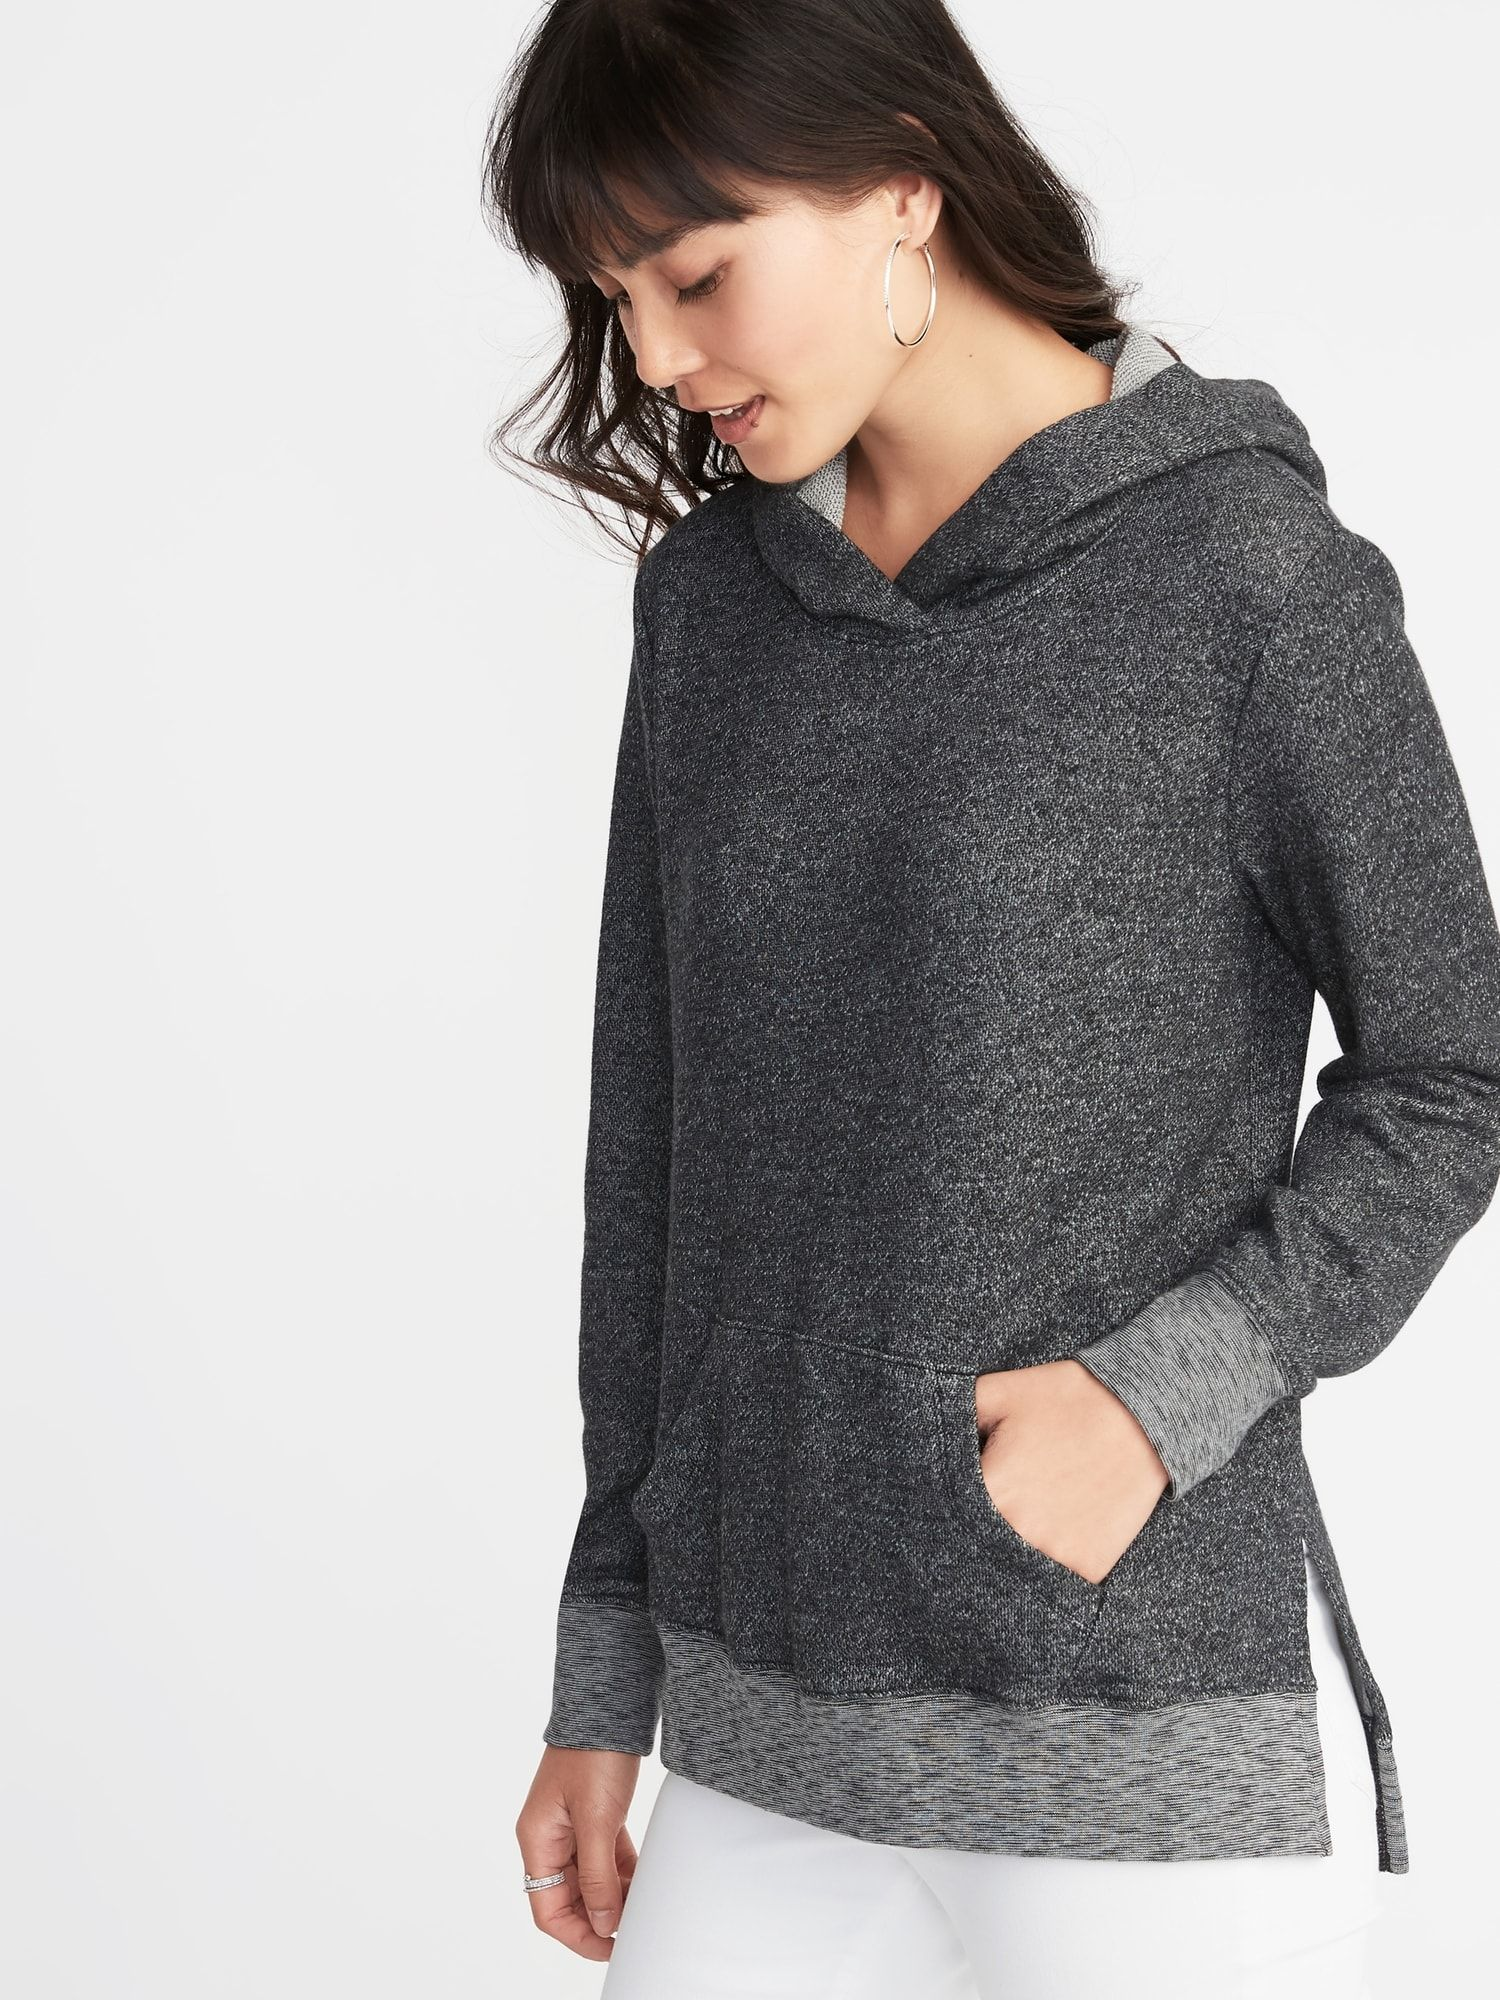 37+ Old navy womens sweatshirts ideas ideas in 2021